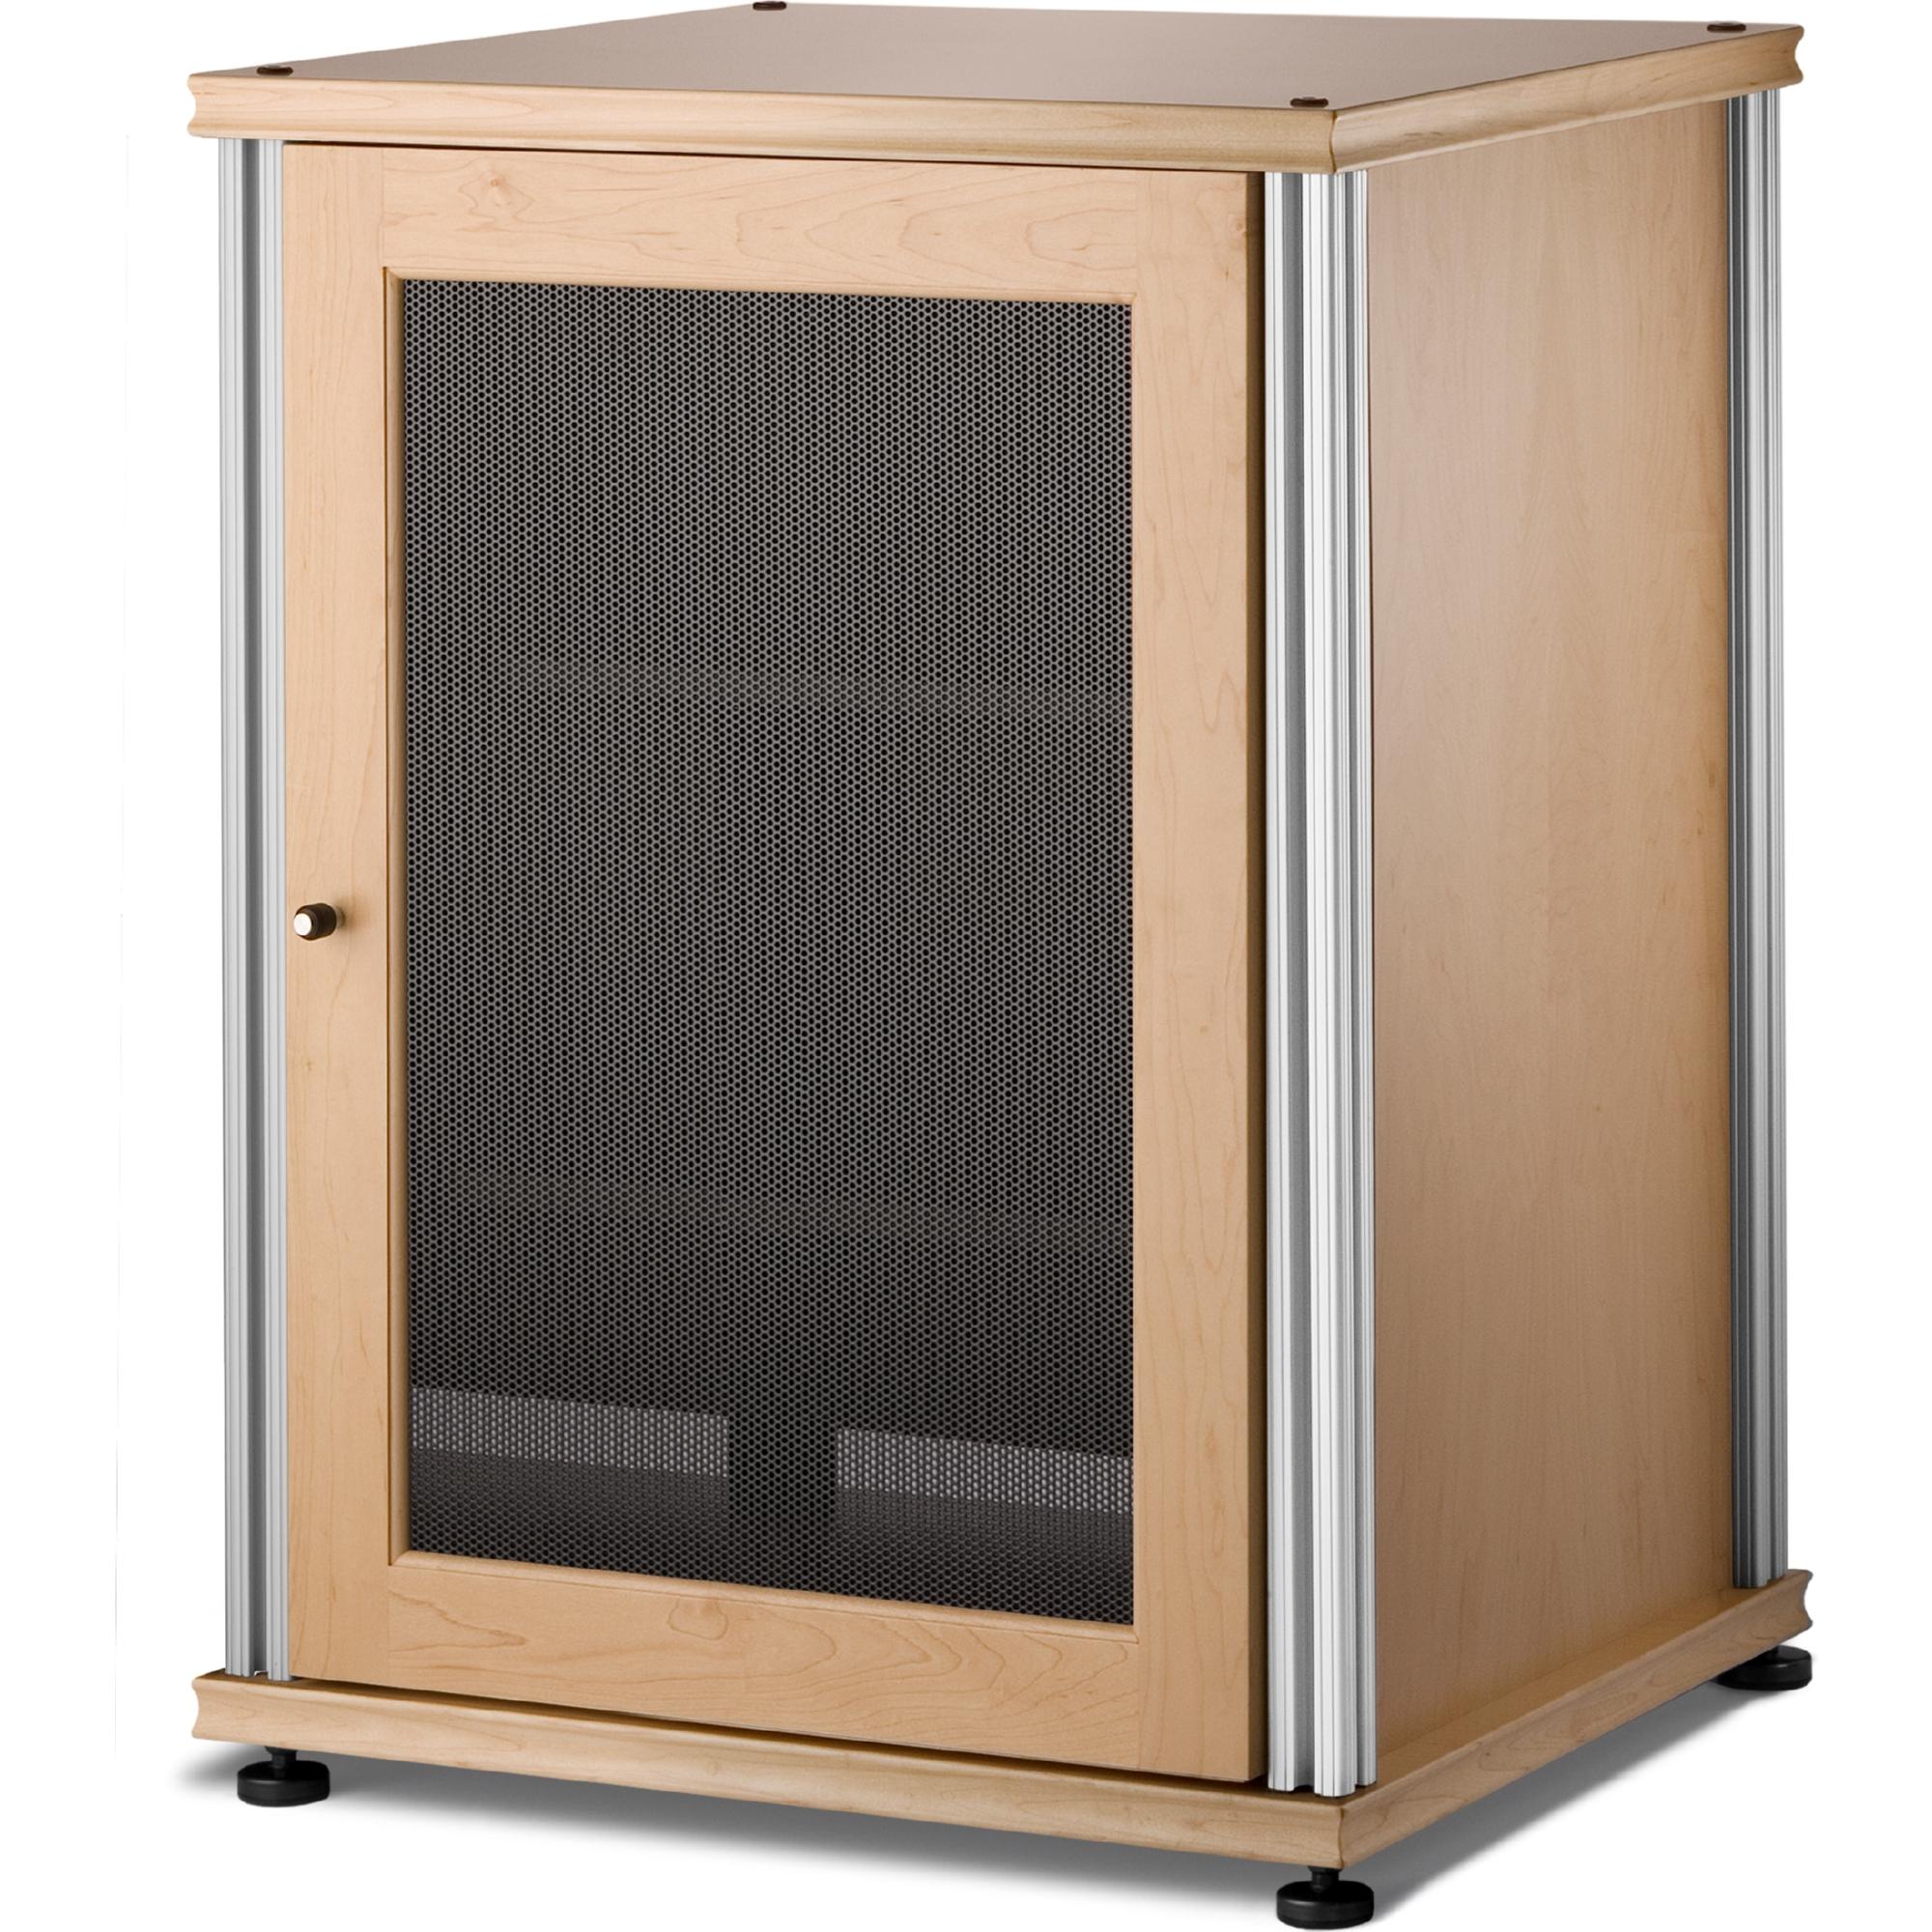 designs product reg oslo b h door salamander shelves c width adjustable cabinet black with twin chameleon av bg